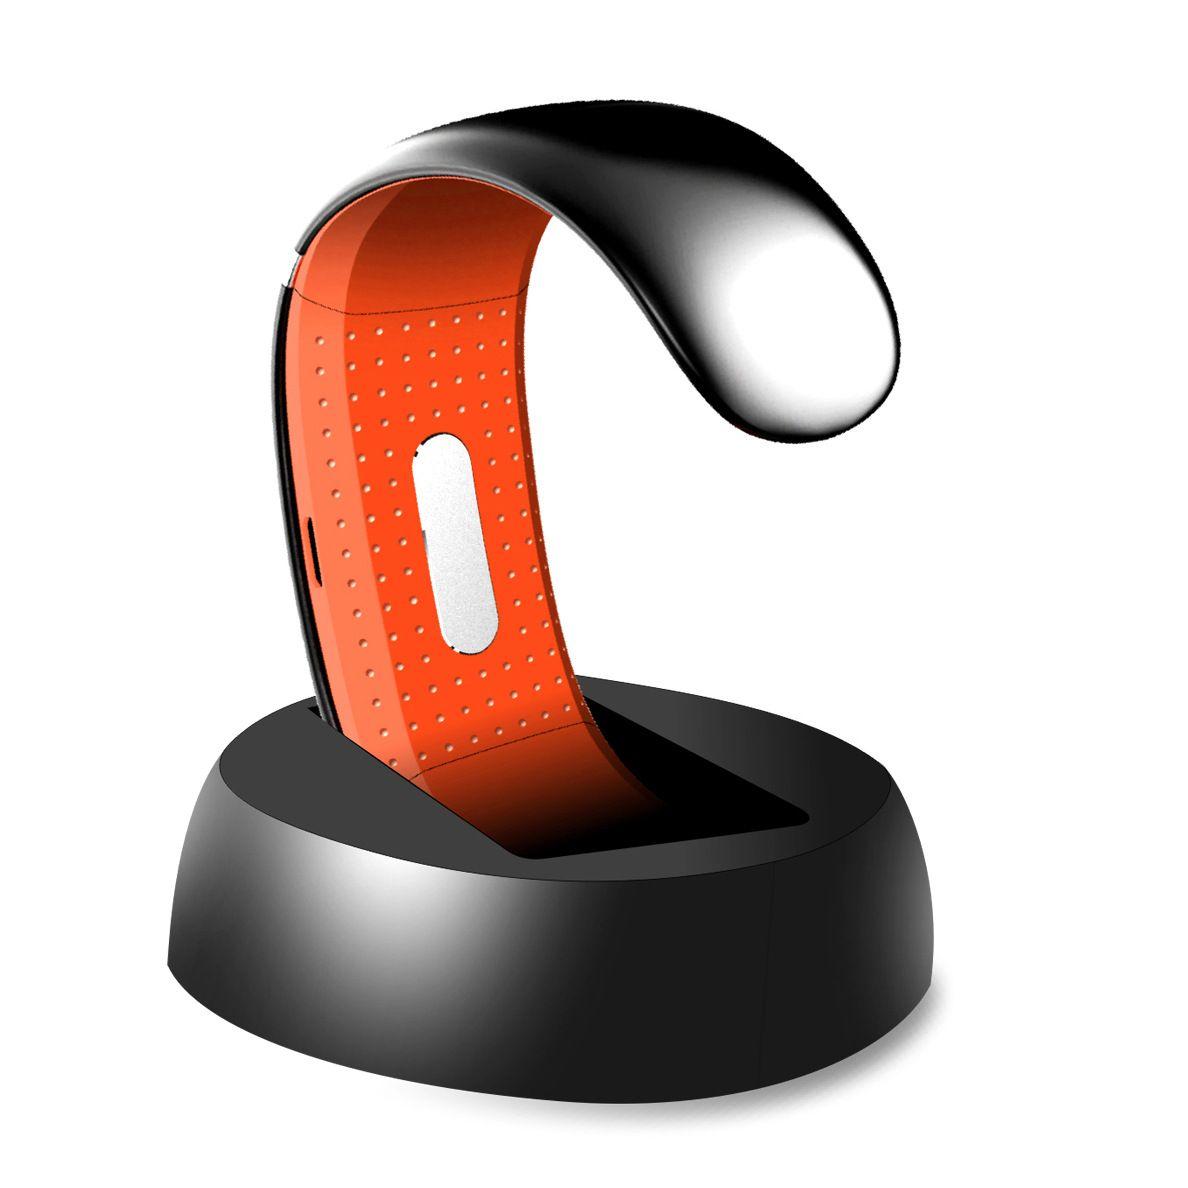 Hot L12S intelligent bracelet bluetooth bracelet movement step gauge sports companion unisex step counting smart bracelet